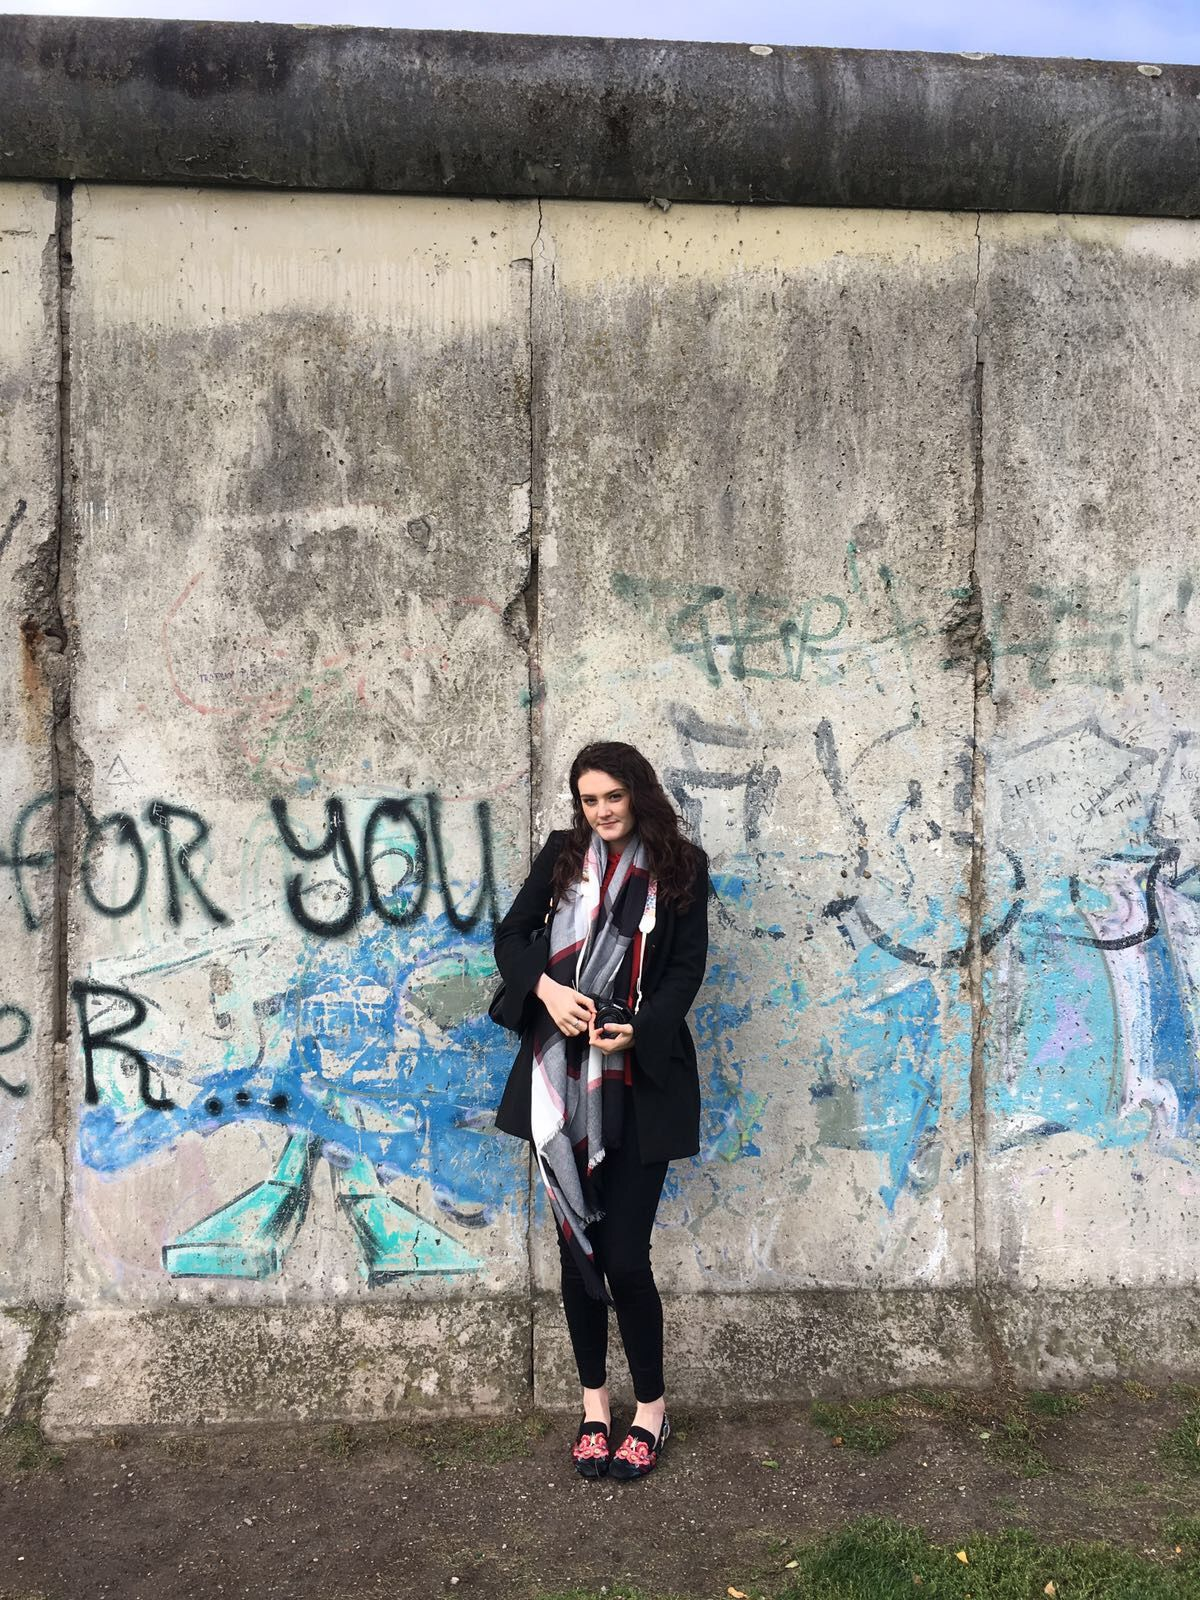 Image may contain: Graffiti, Person, People, Human